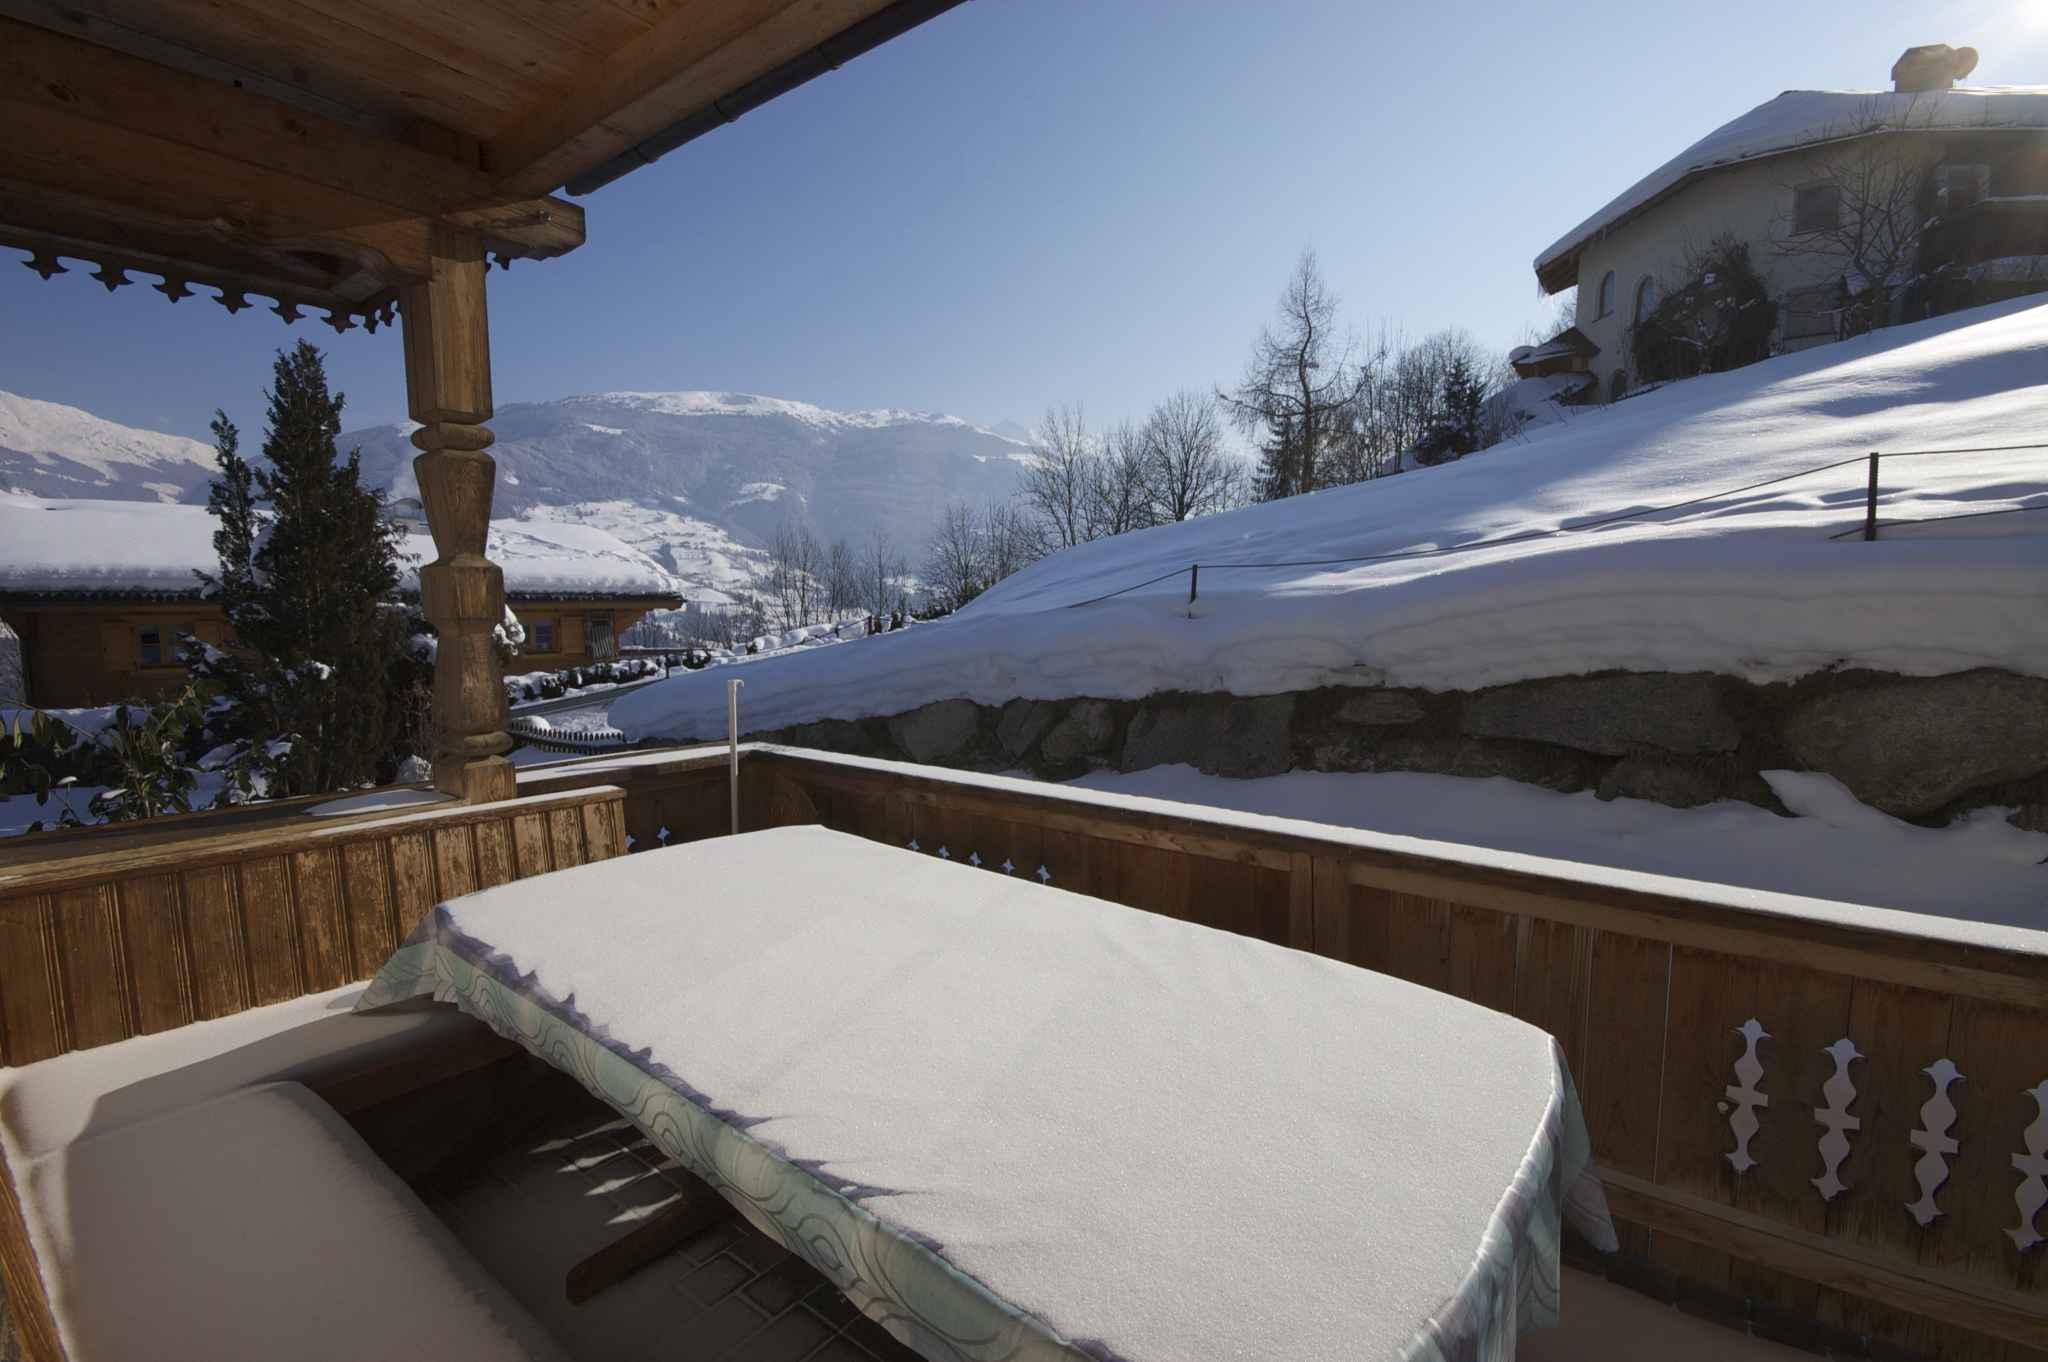 Holiday house direkt an der Skipiste Skigebiet Hochzillertal (430933), Kaltenbach, Zillertal, Tyrol, Austria, picture 19